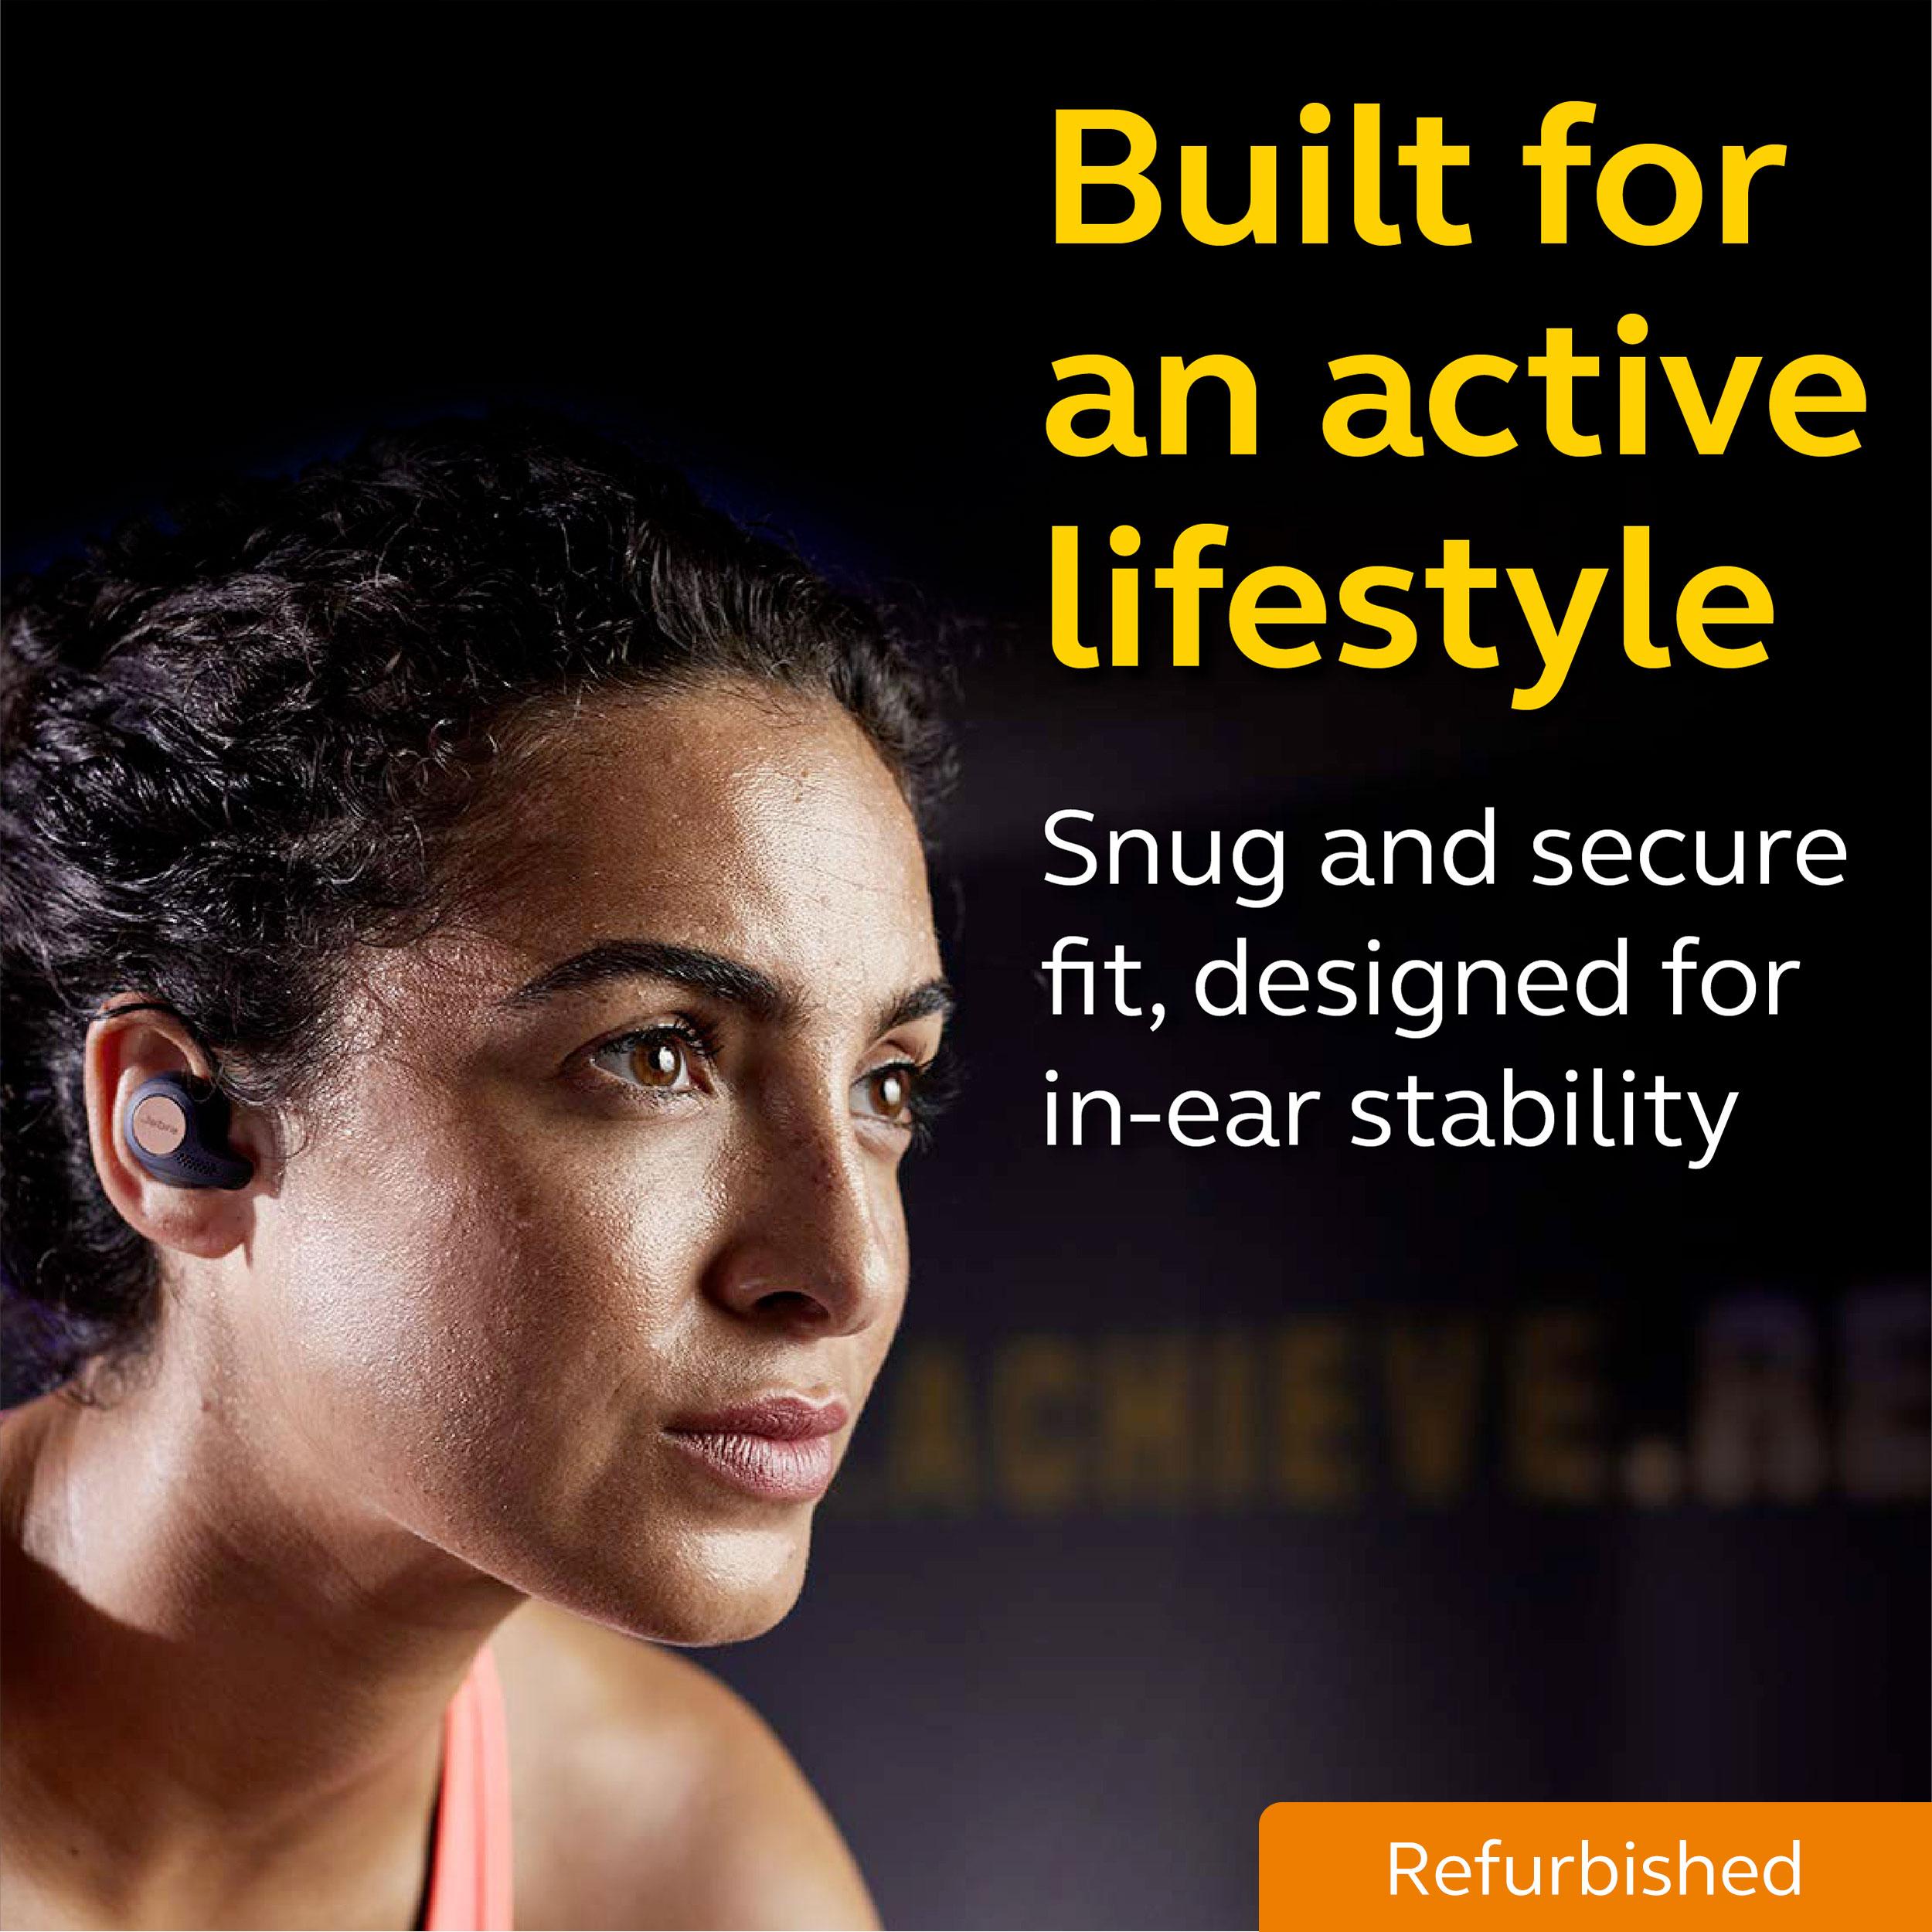 thumbnail 14 - Jabra Elite Active 65t True Wireless Earbuds (Certified Refurbished)